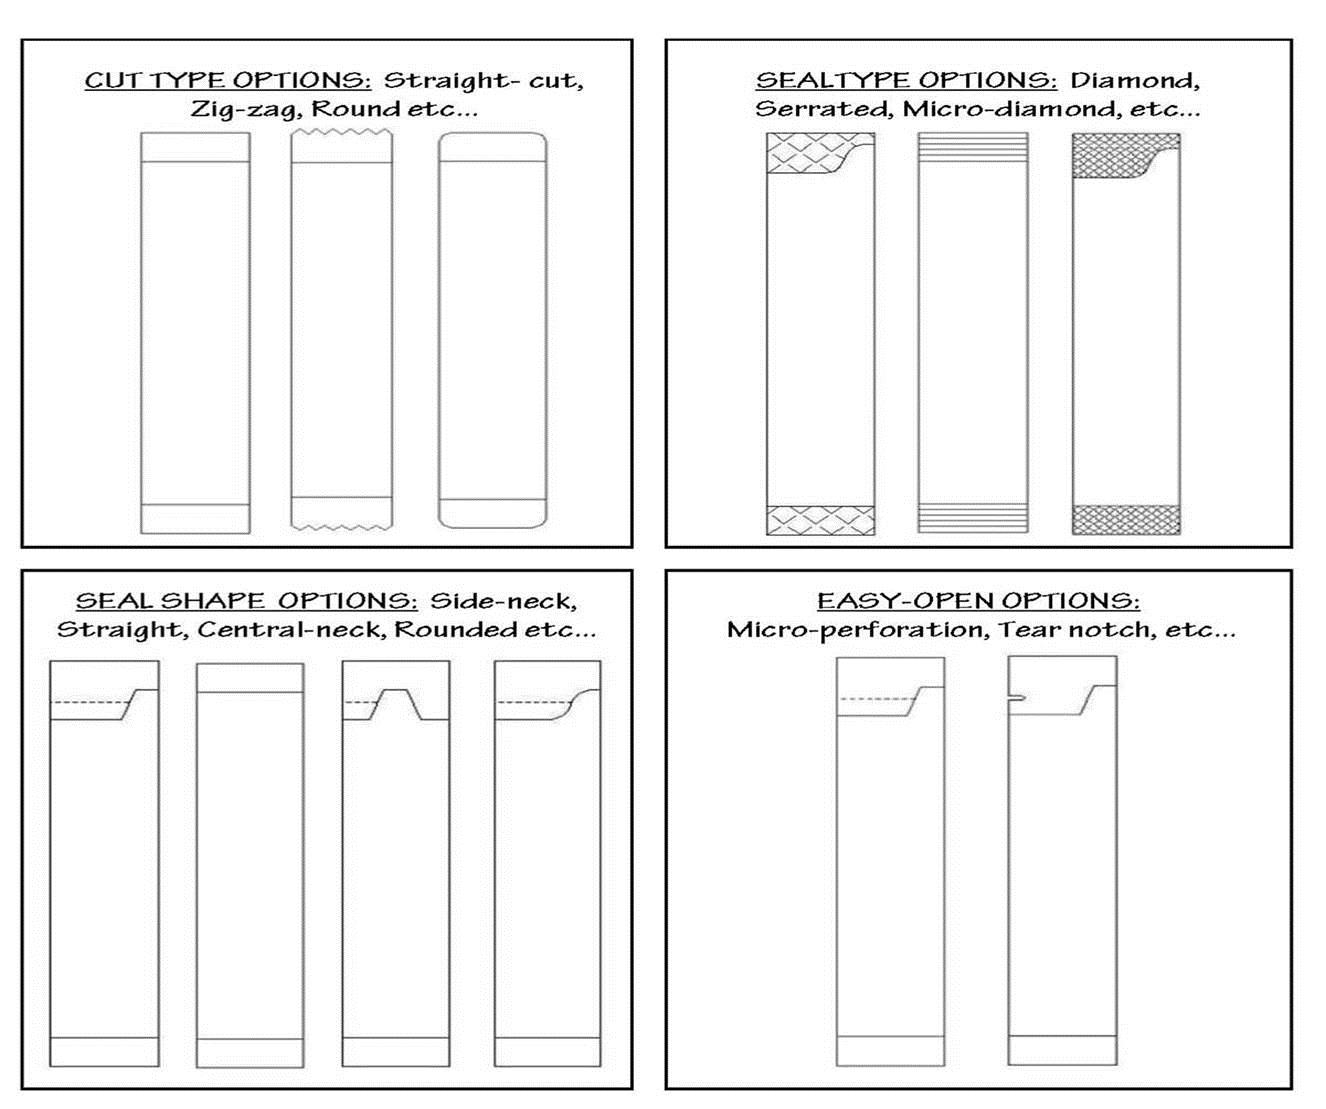 Viking-Masek-Stick-Pack-Options-for-Packaging.png